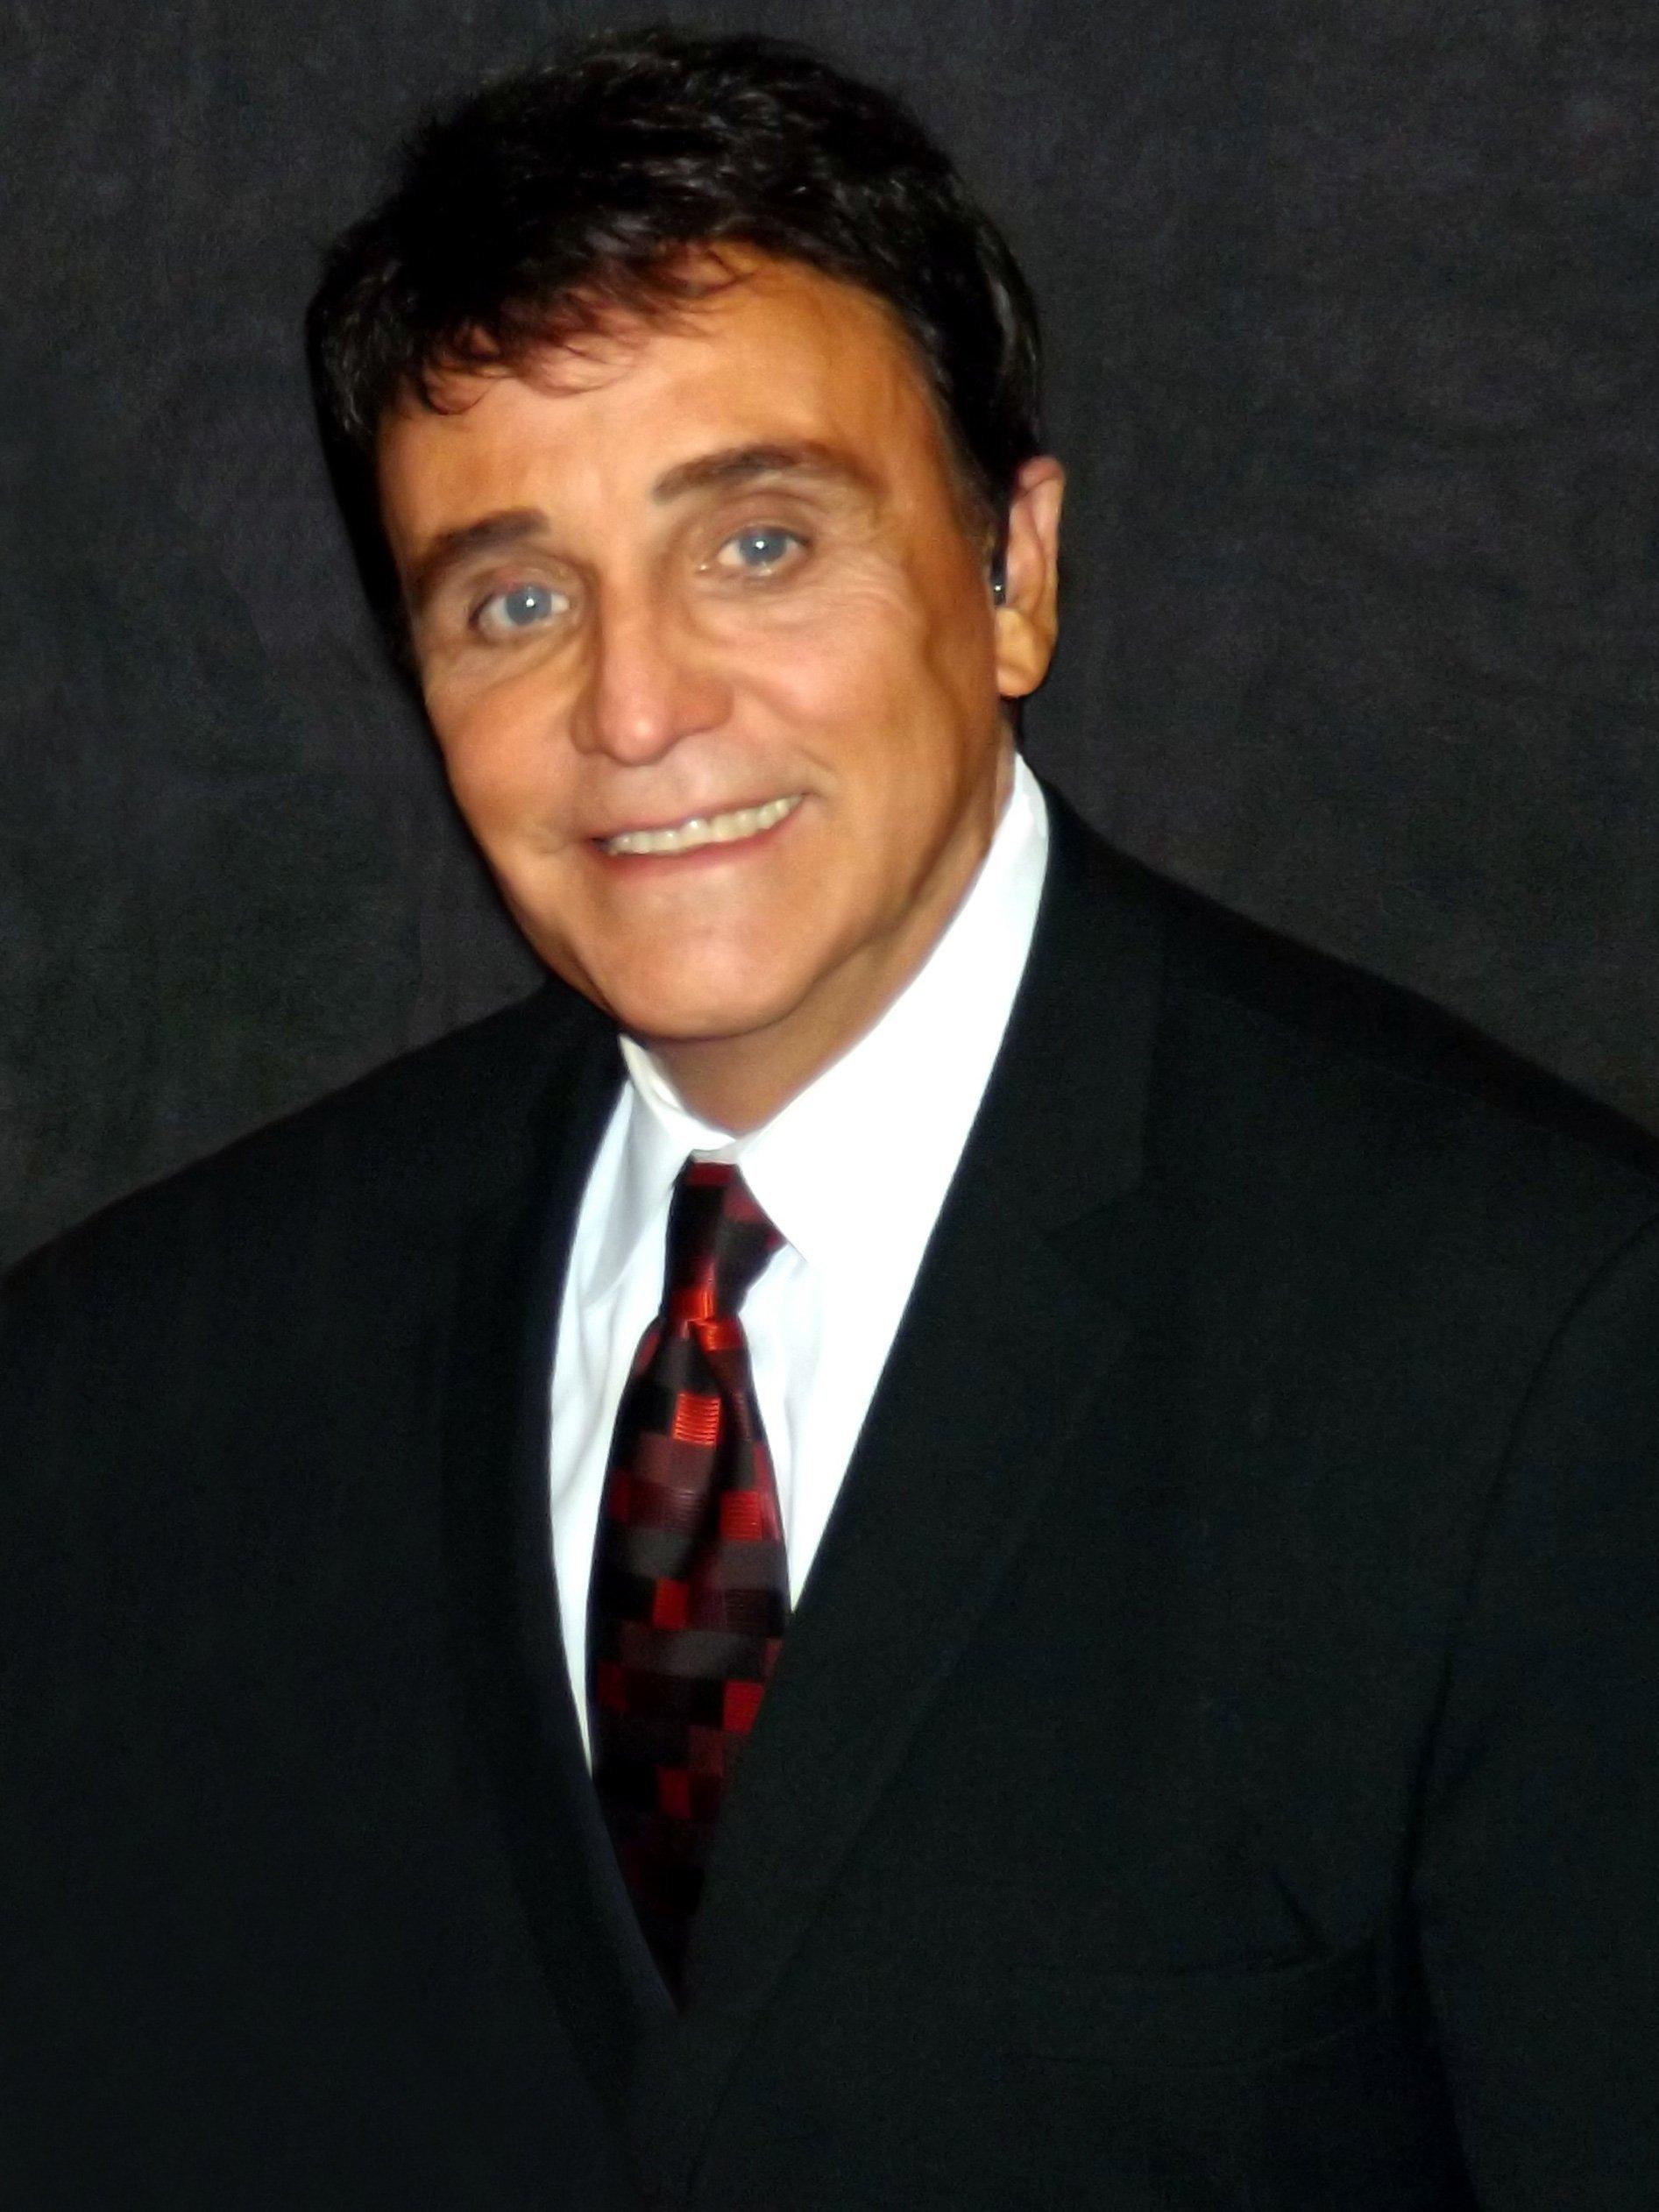 Pastor Gary McSpadden